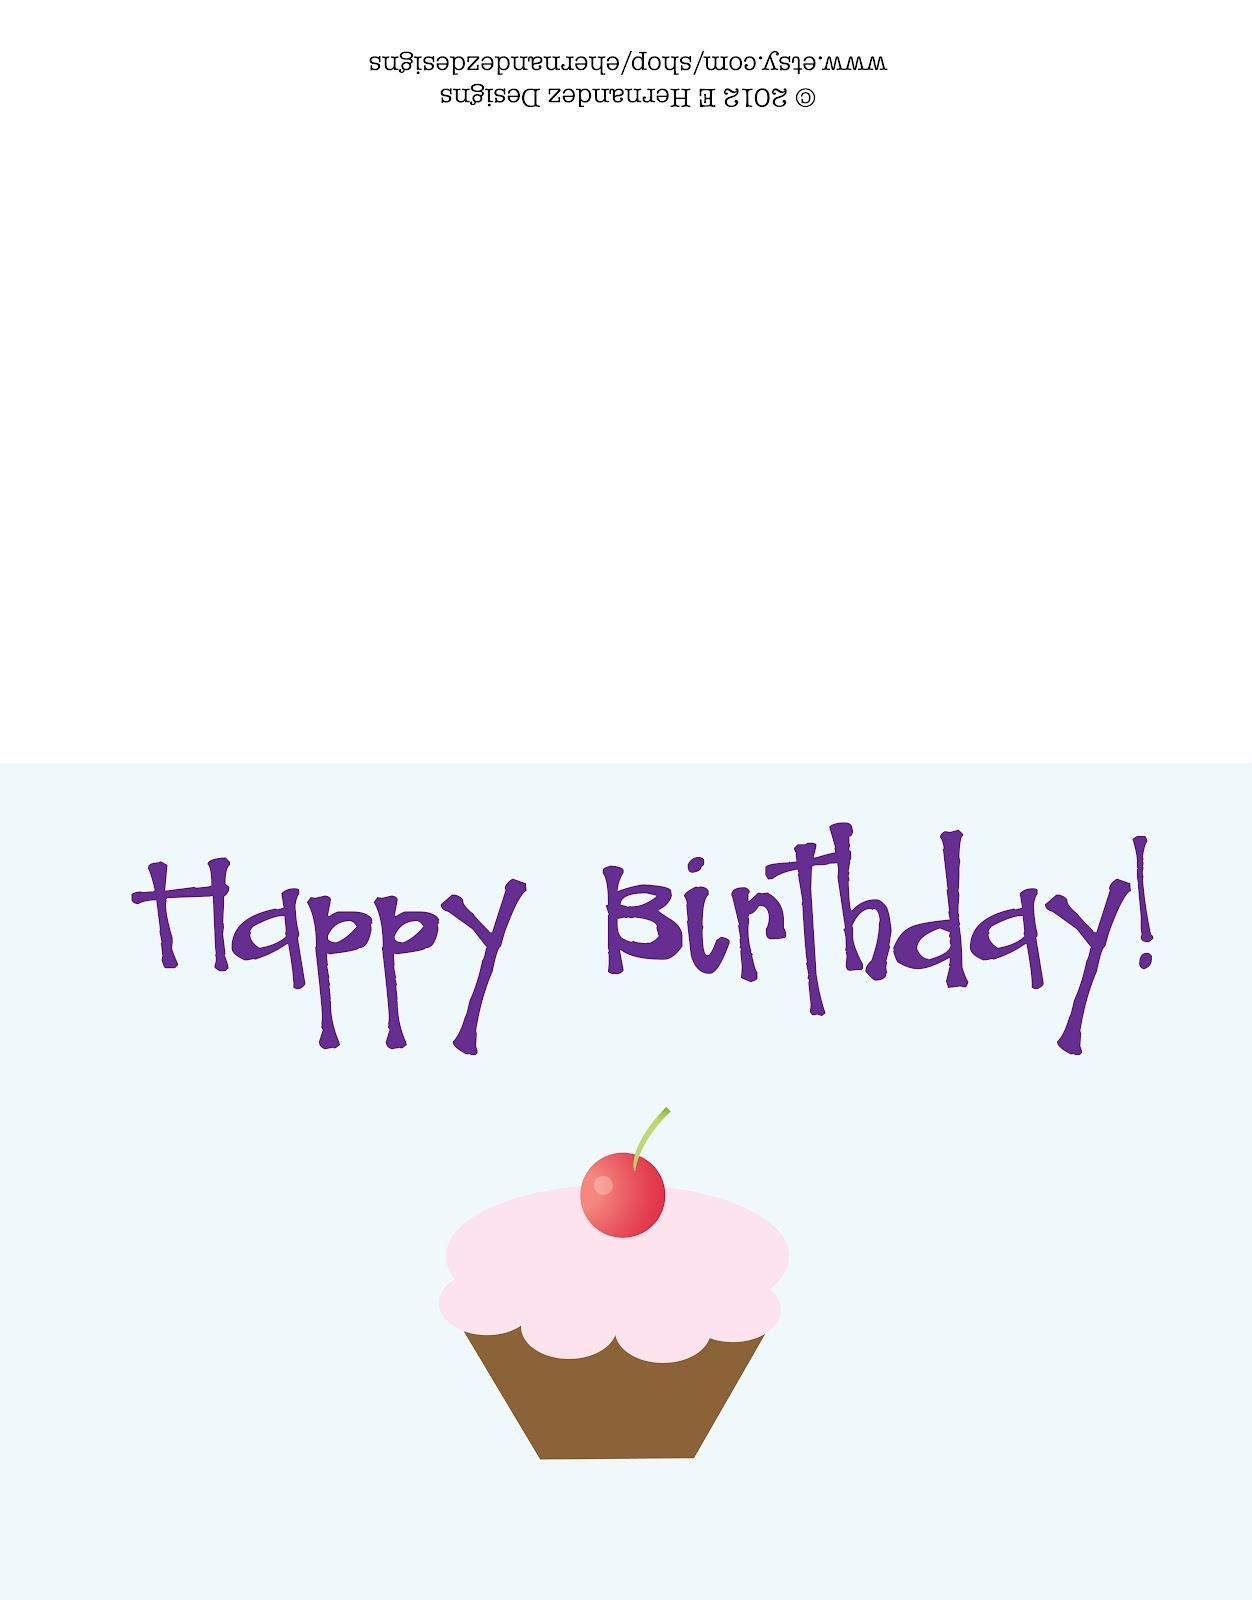 Printable Birthday Card Free | Lexu.tk - Free Online Funny Birthday Cards Printable